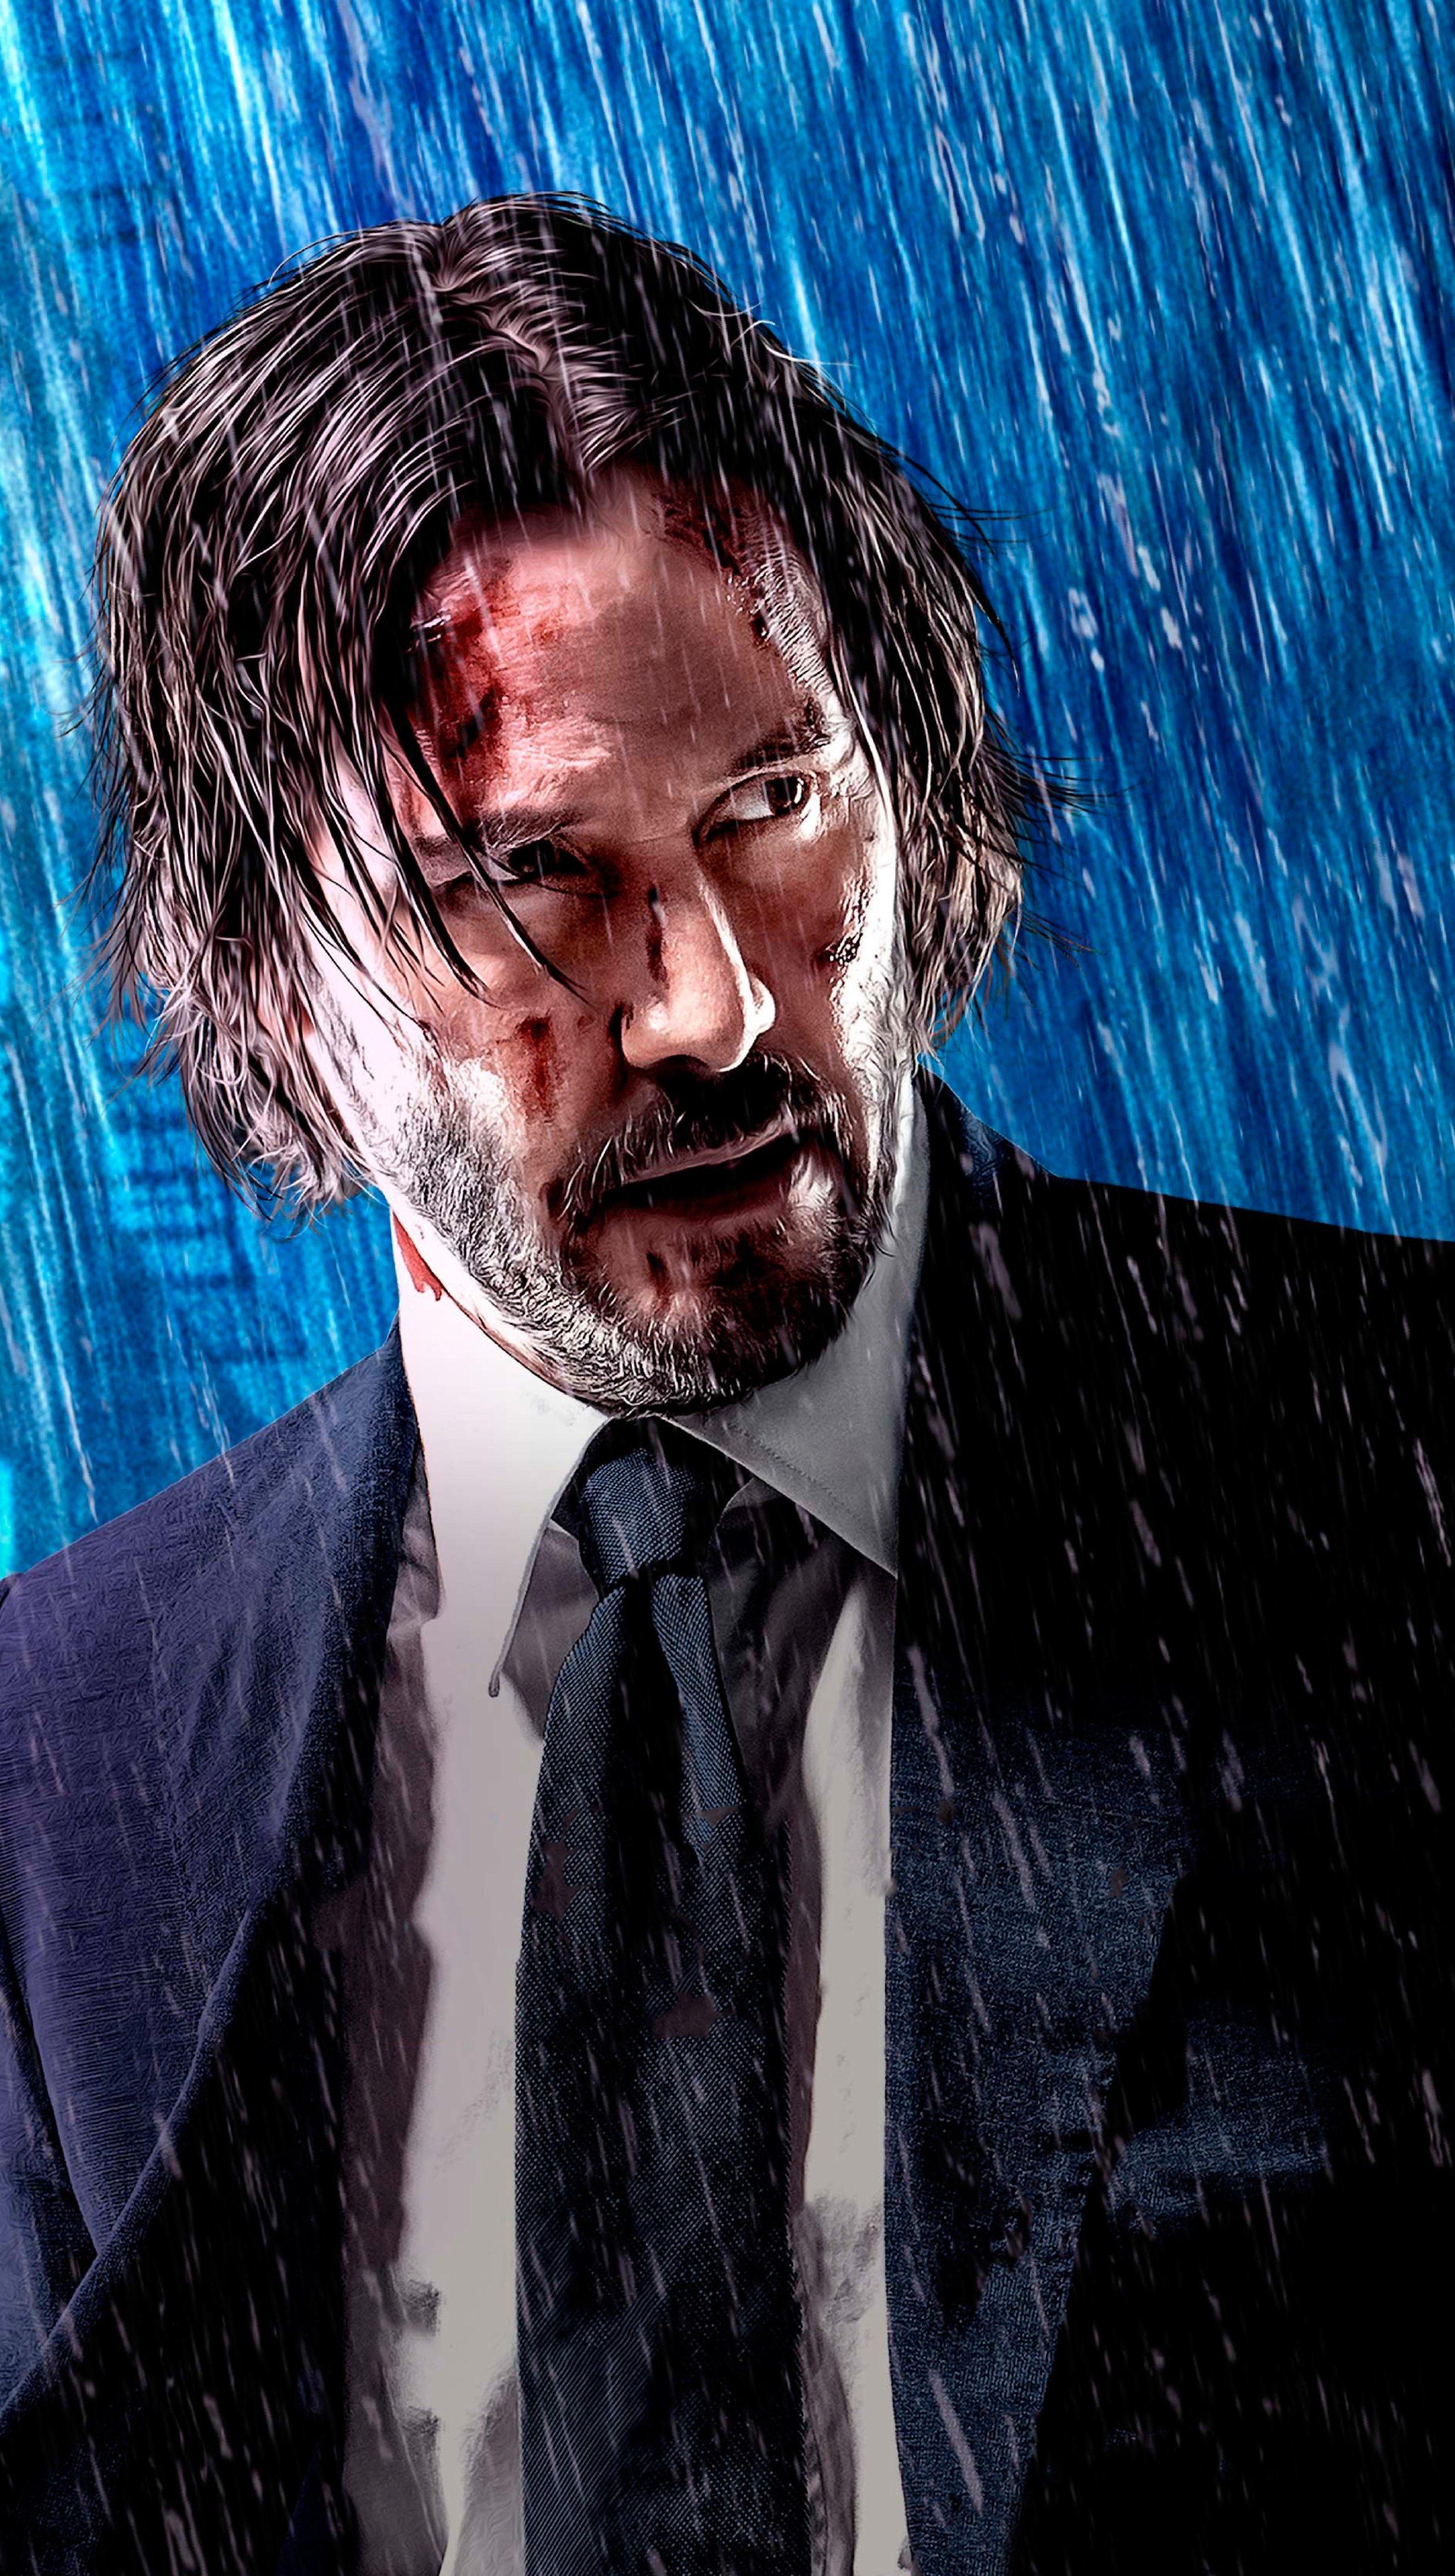 Wallpaper John Wick 3 Parebellum Keanu Reeves Vertical